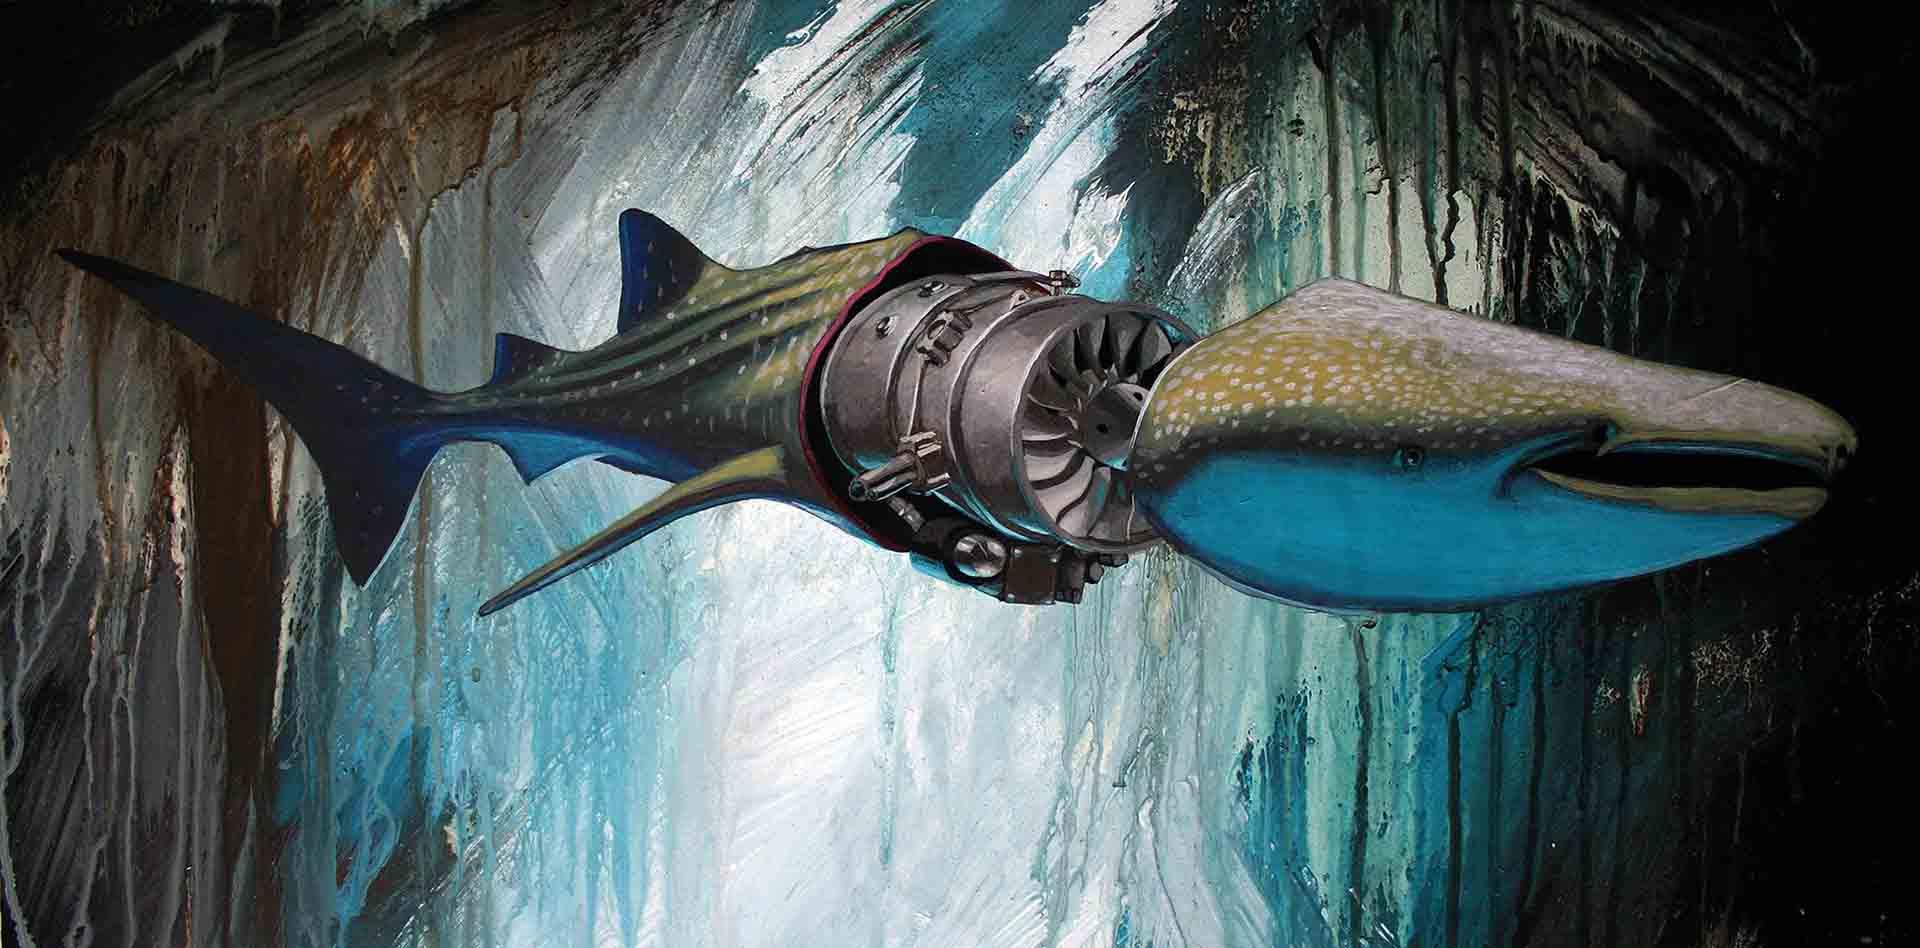 whale shark with machine engine body